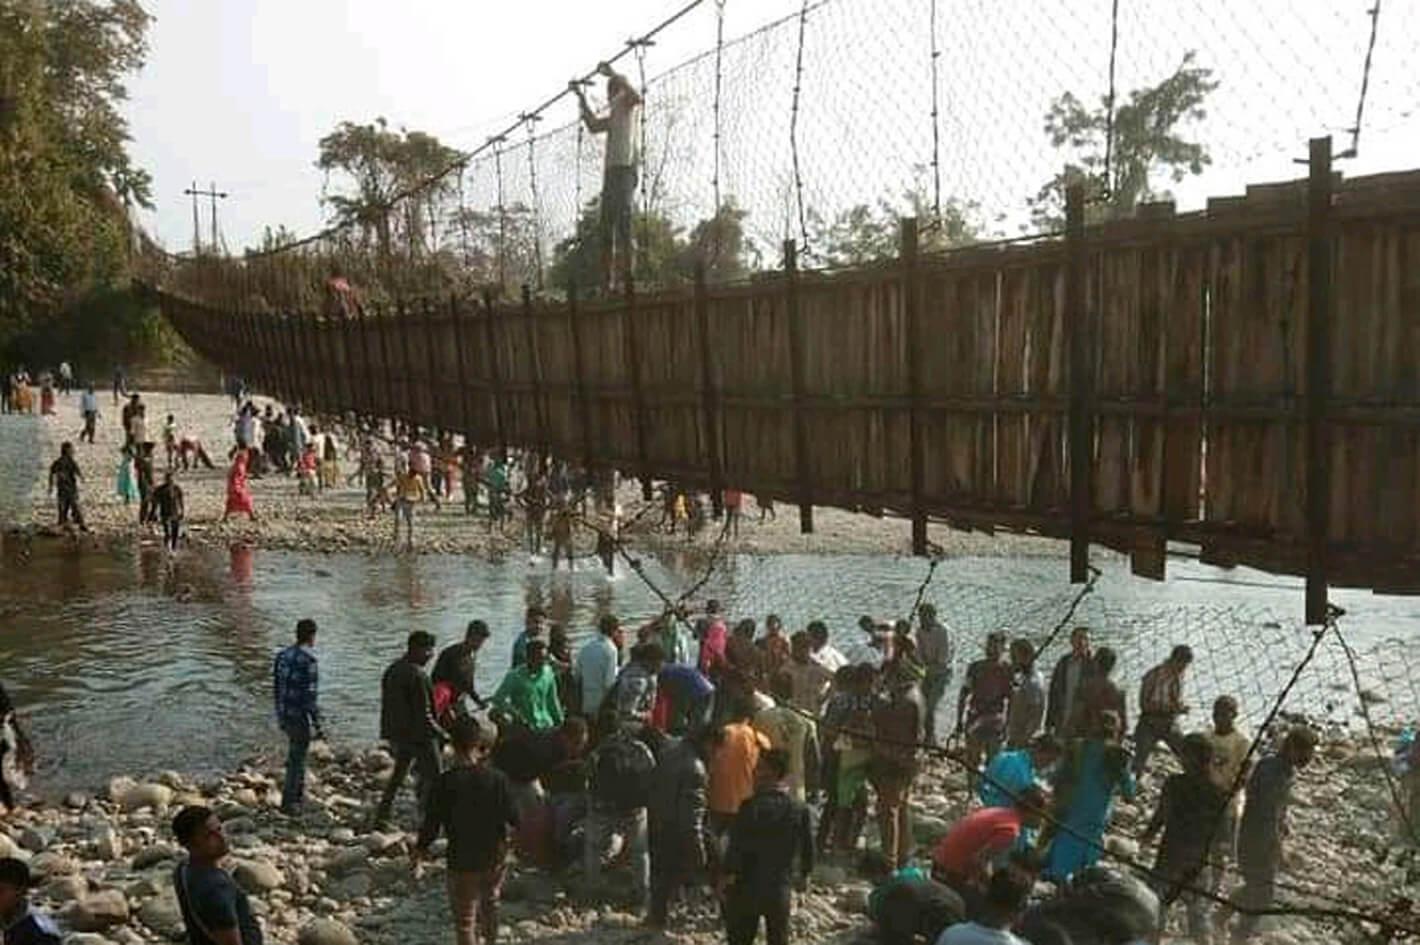 48 injured as bridge collapses in Arunachal